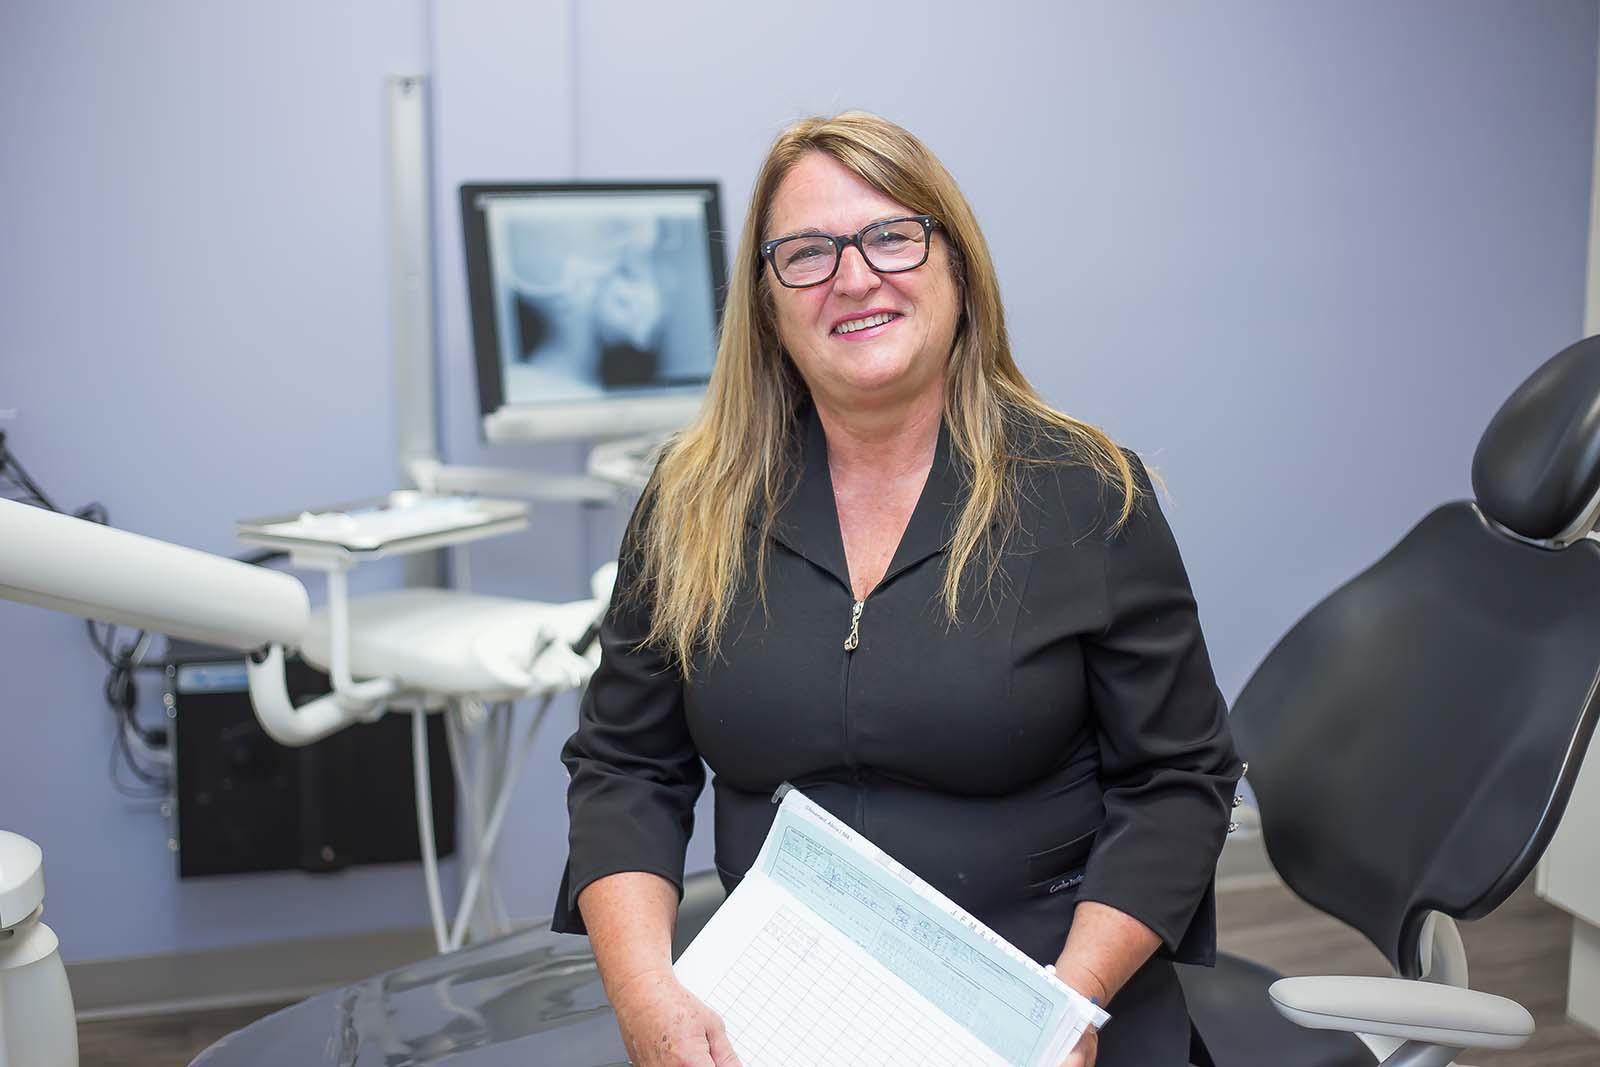 http://www.dentistedrummondville.com/wp-content/uploads/2015/12/Michelle-Assistante-dentaire.jpg